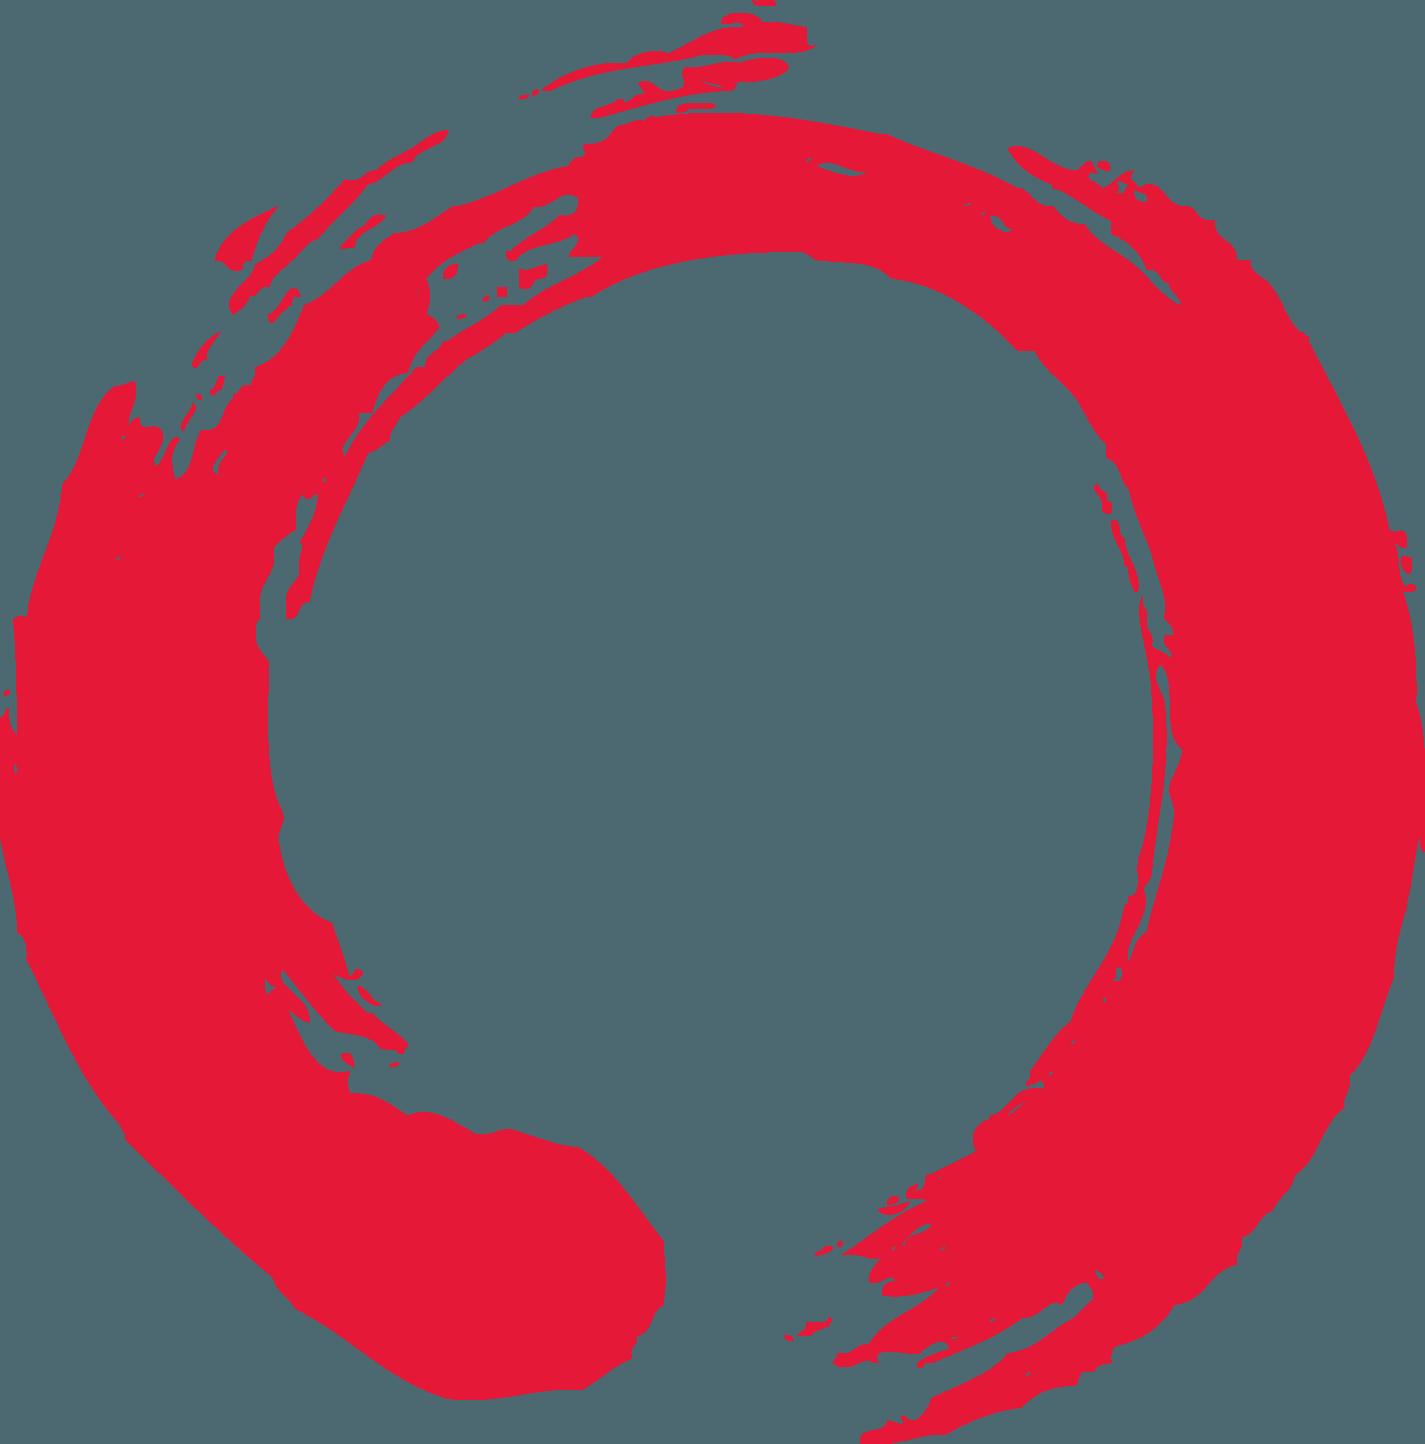 Circle PNG-PlusPNG.com-1425 - Circle PNG